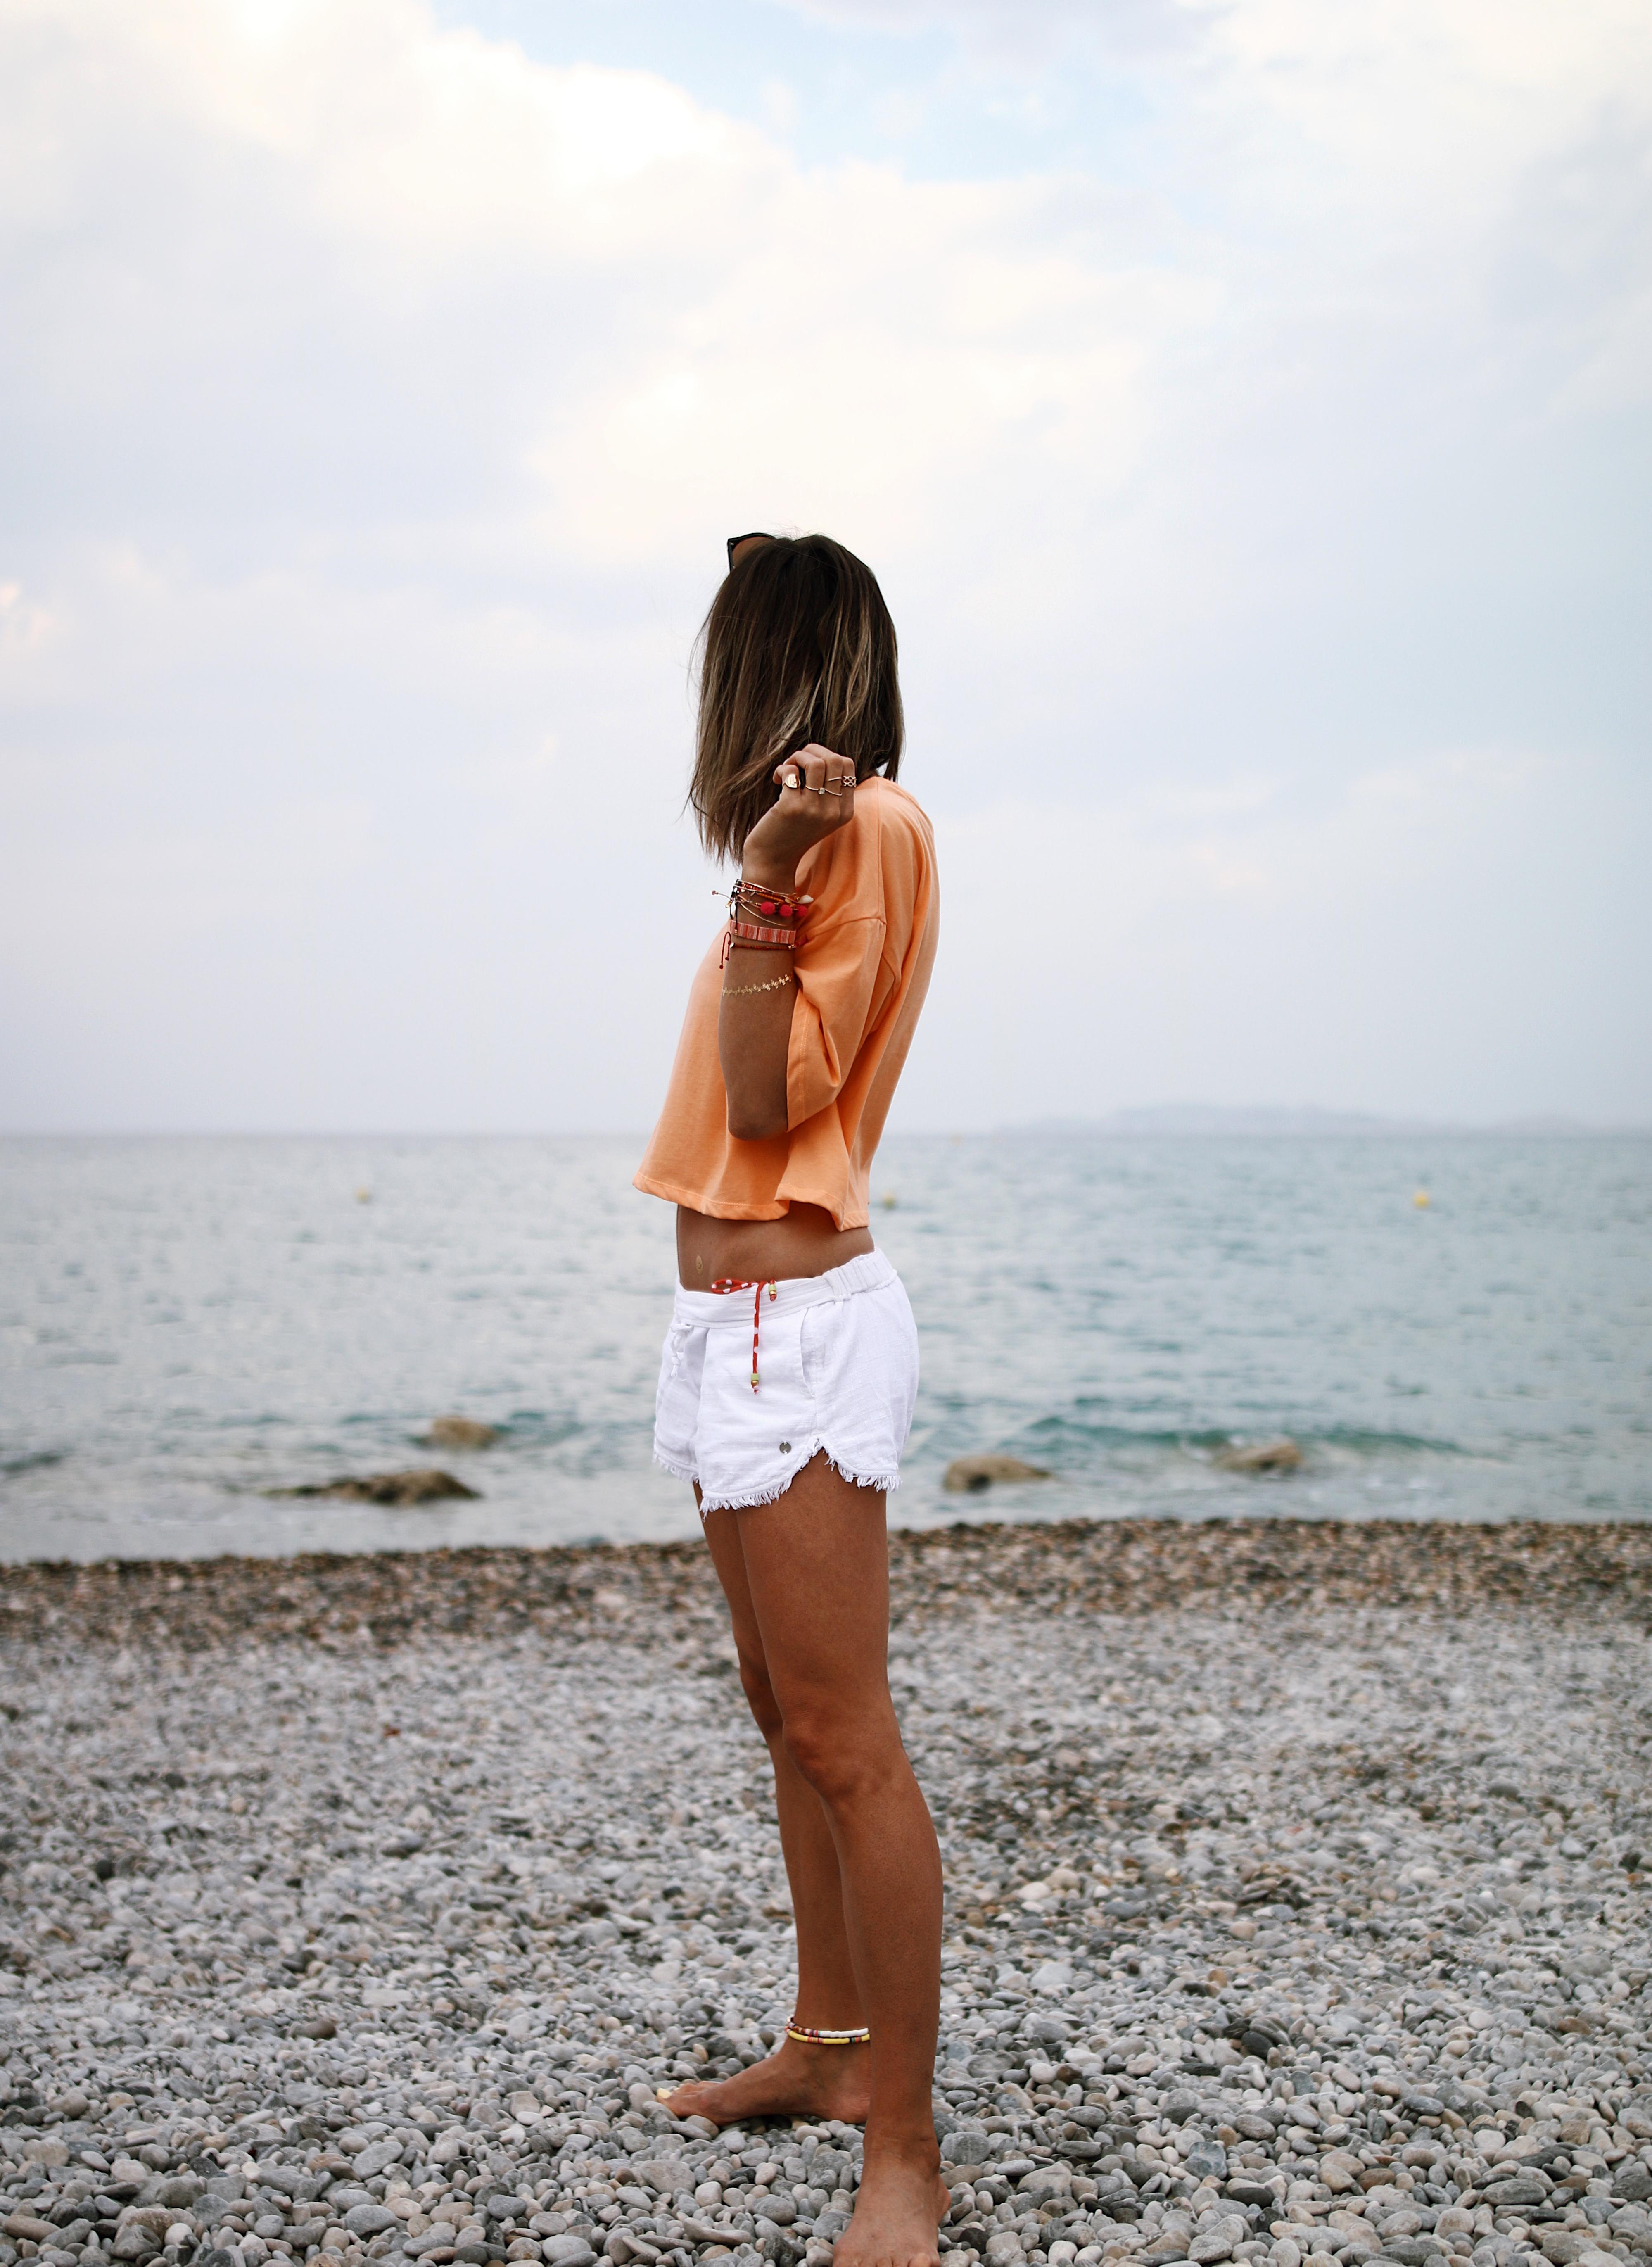 @chon.and.chon WWW.CHONANDCHON.COM - bikini banana moon dolcevita orange, brassière bandeau - bikini life, beachlife, #bikiniaddict, FASHION BLOGGER, bikini life, BANANA MOON BIKINI